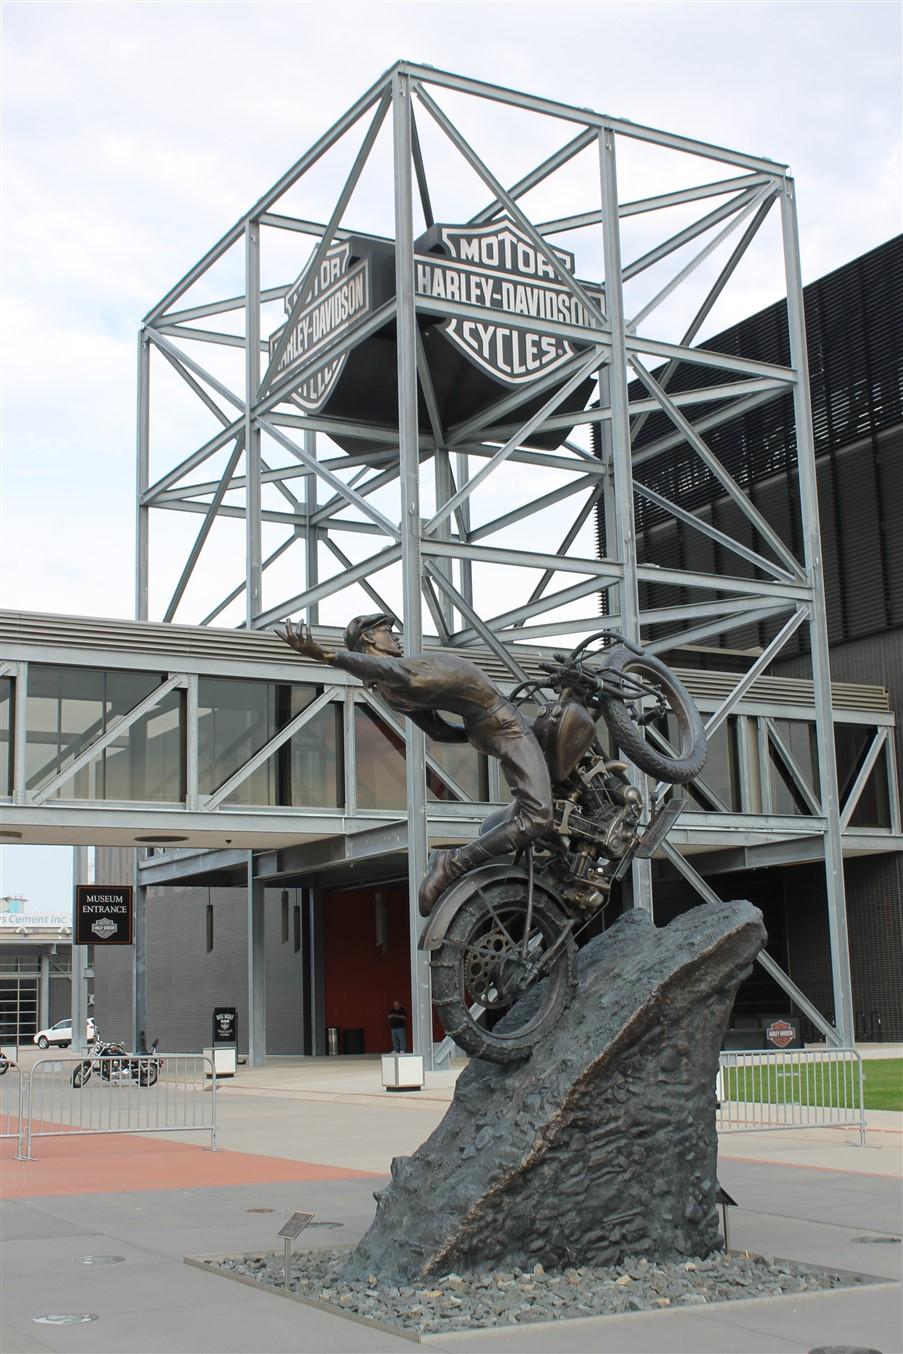 2014 09 20 34 Harley Davidson Museum Milwaukee